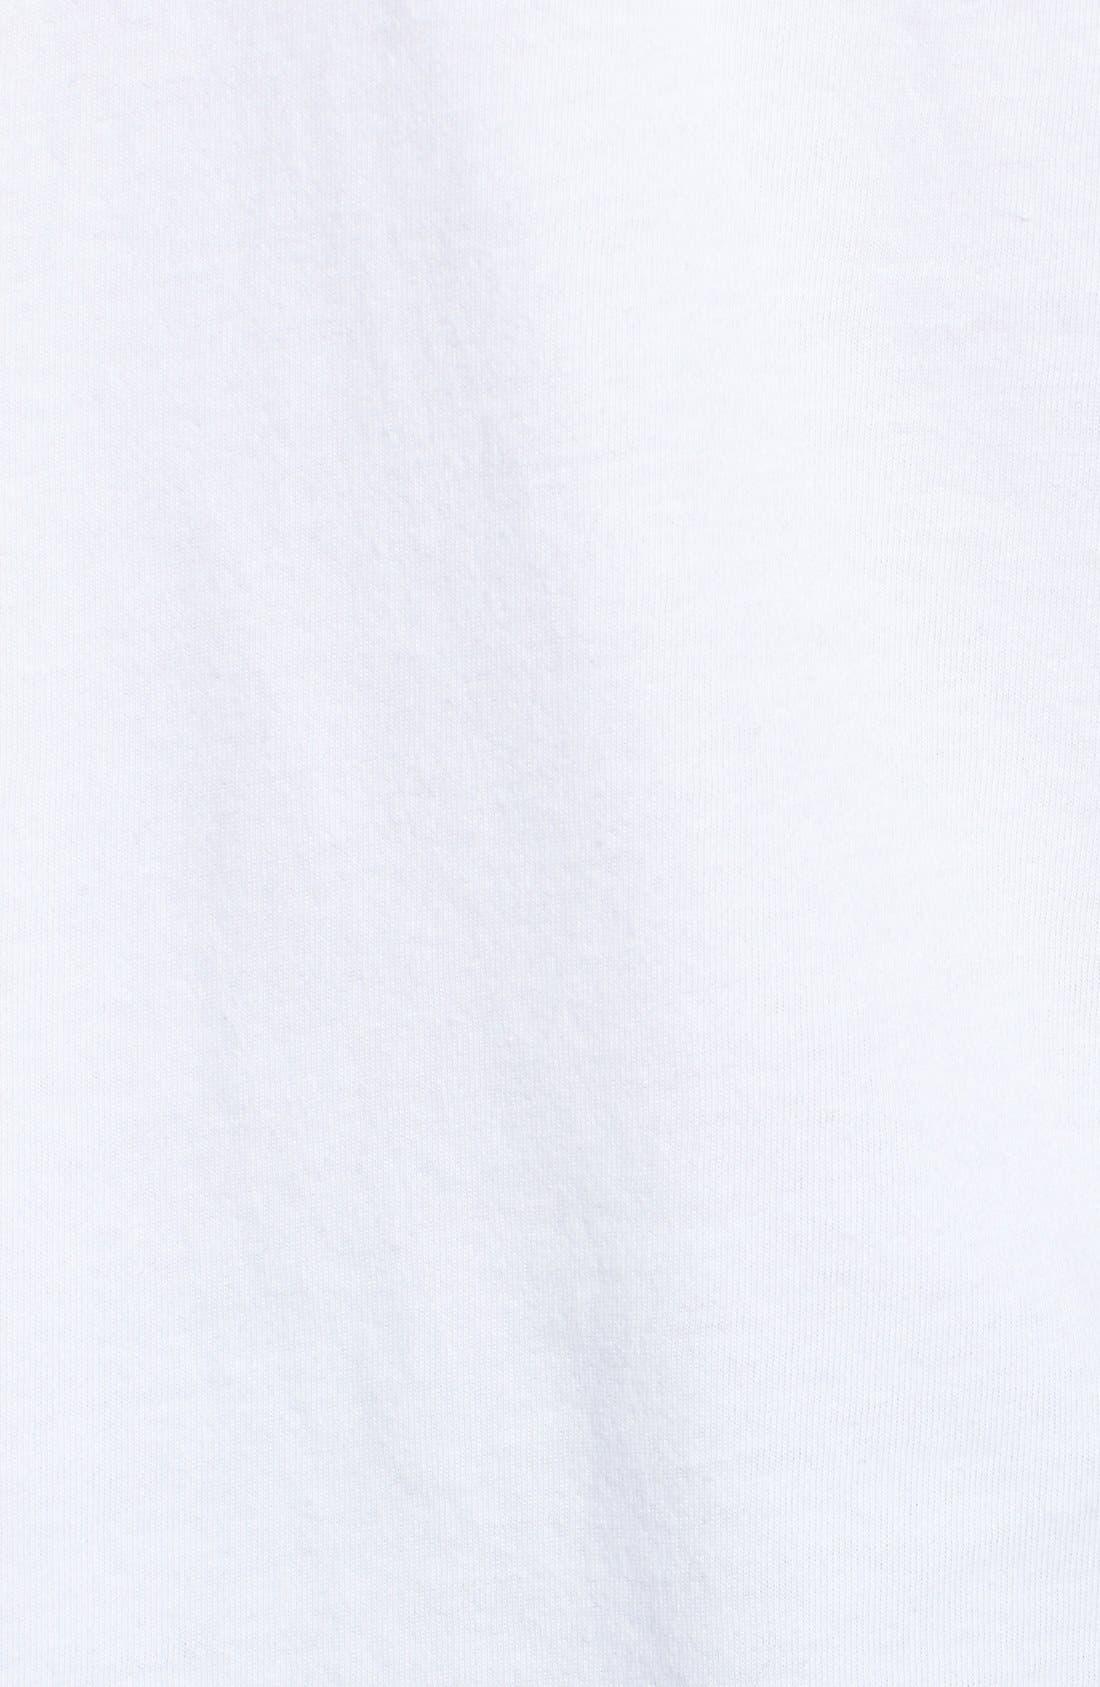 Alternate Image 3  - Junk Food 'Oakland Raiders' Graphic T-Shirt